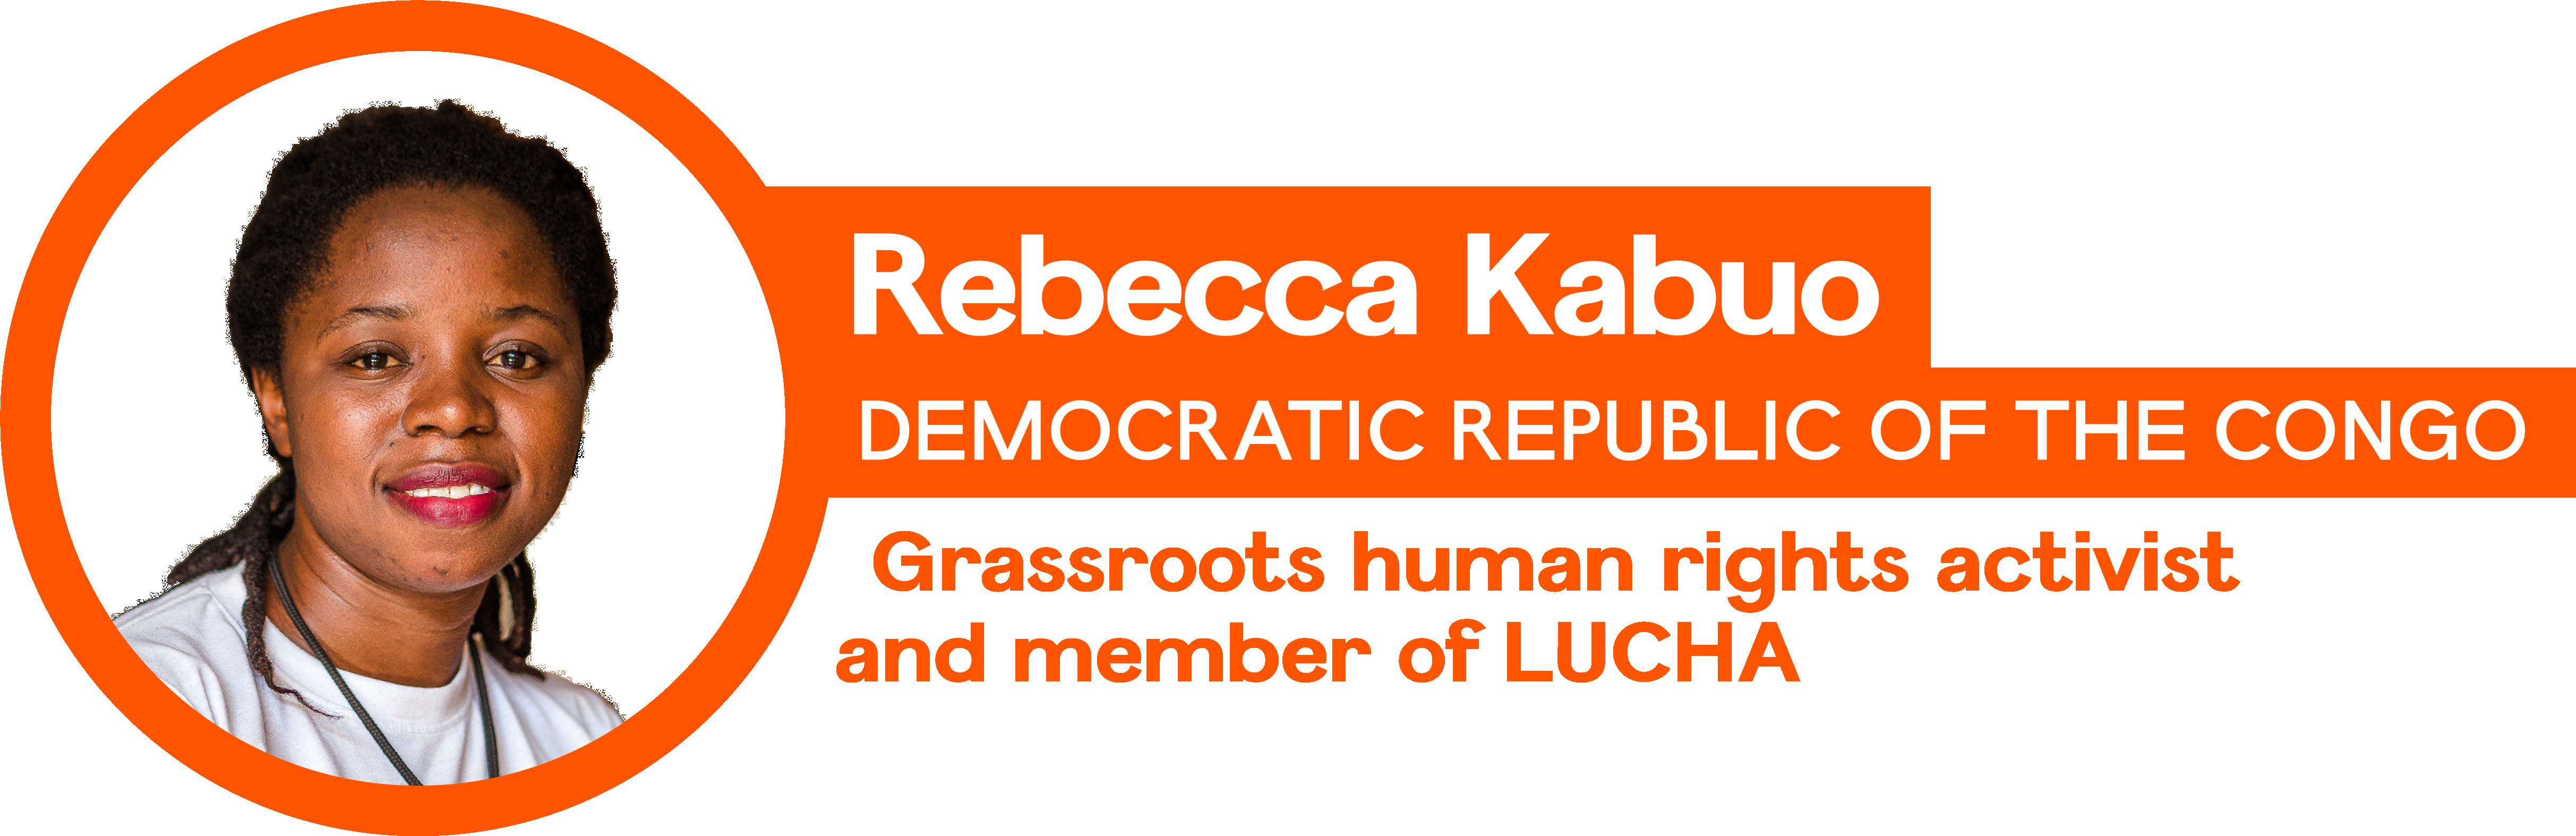 Rebecca Kabuo_1